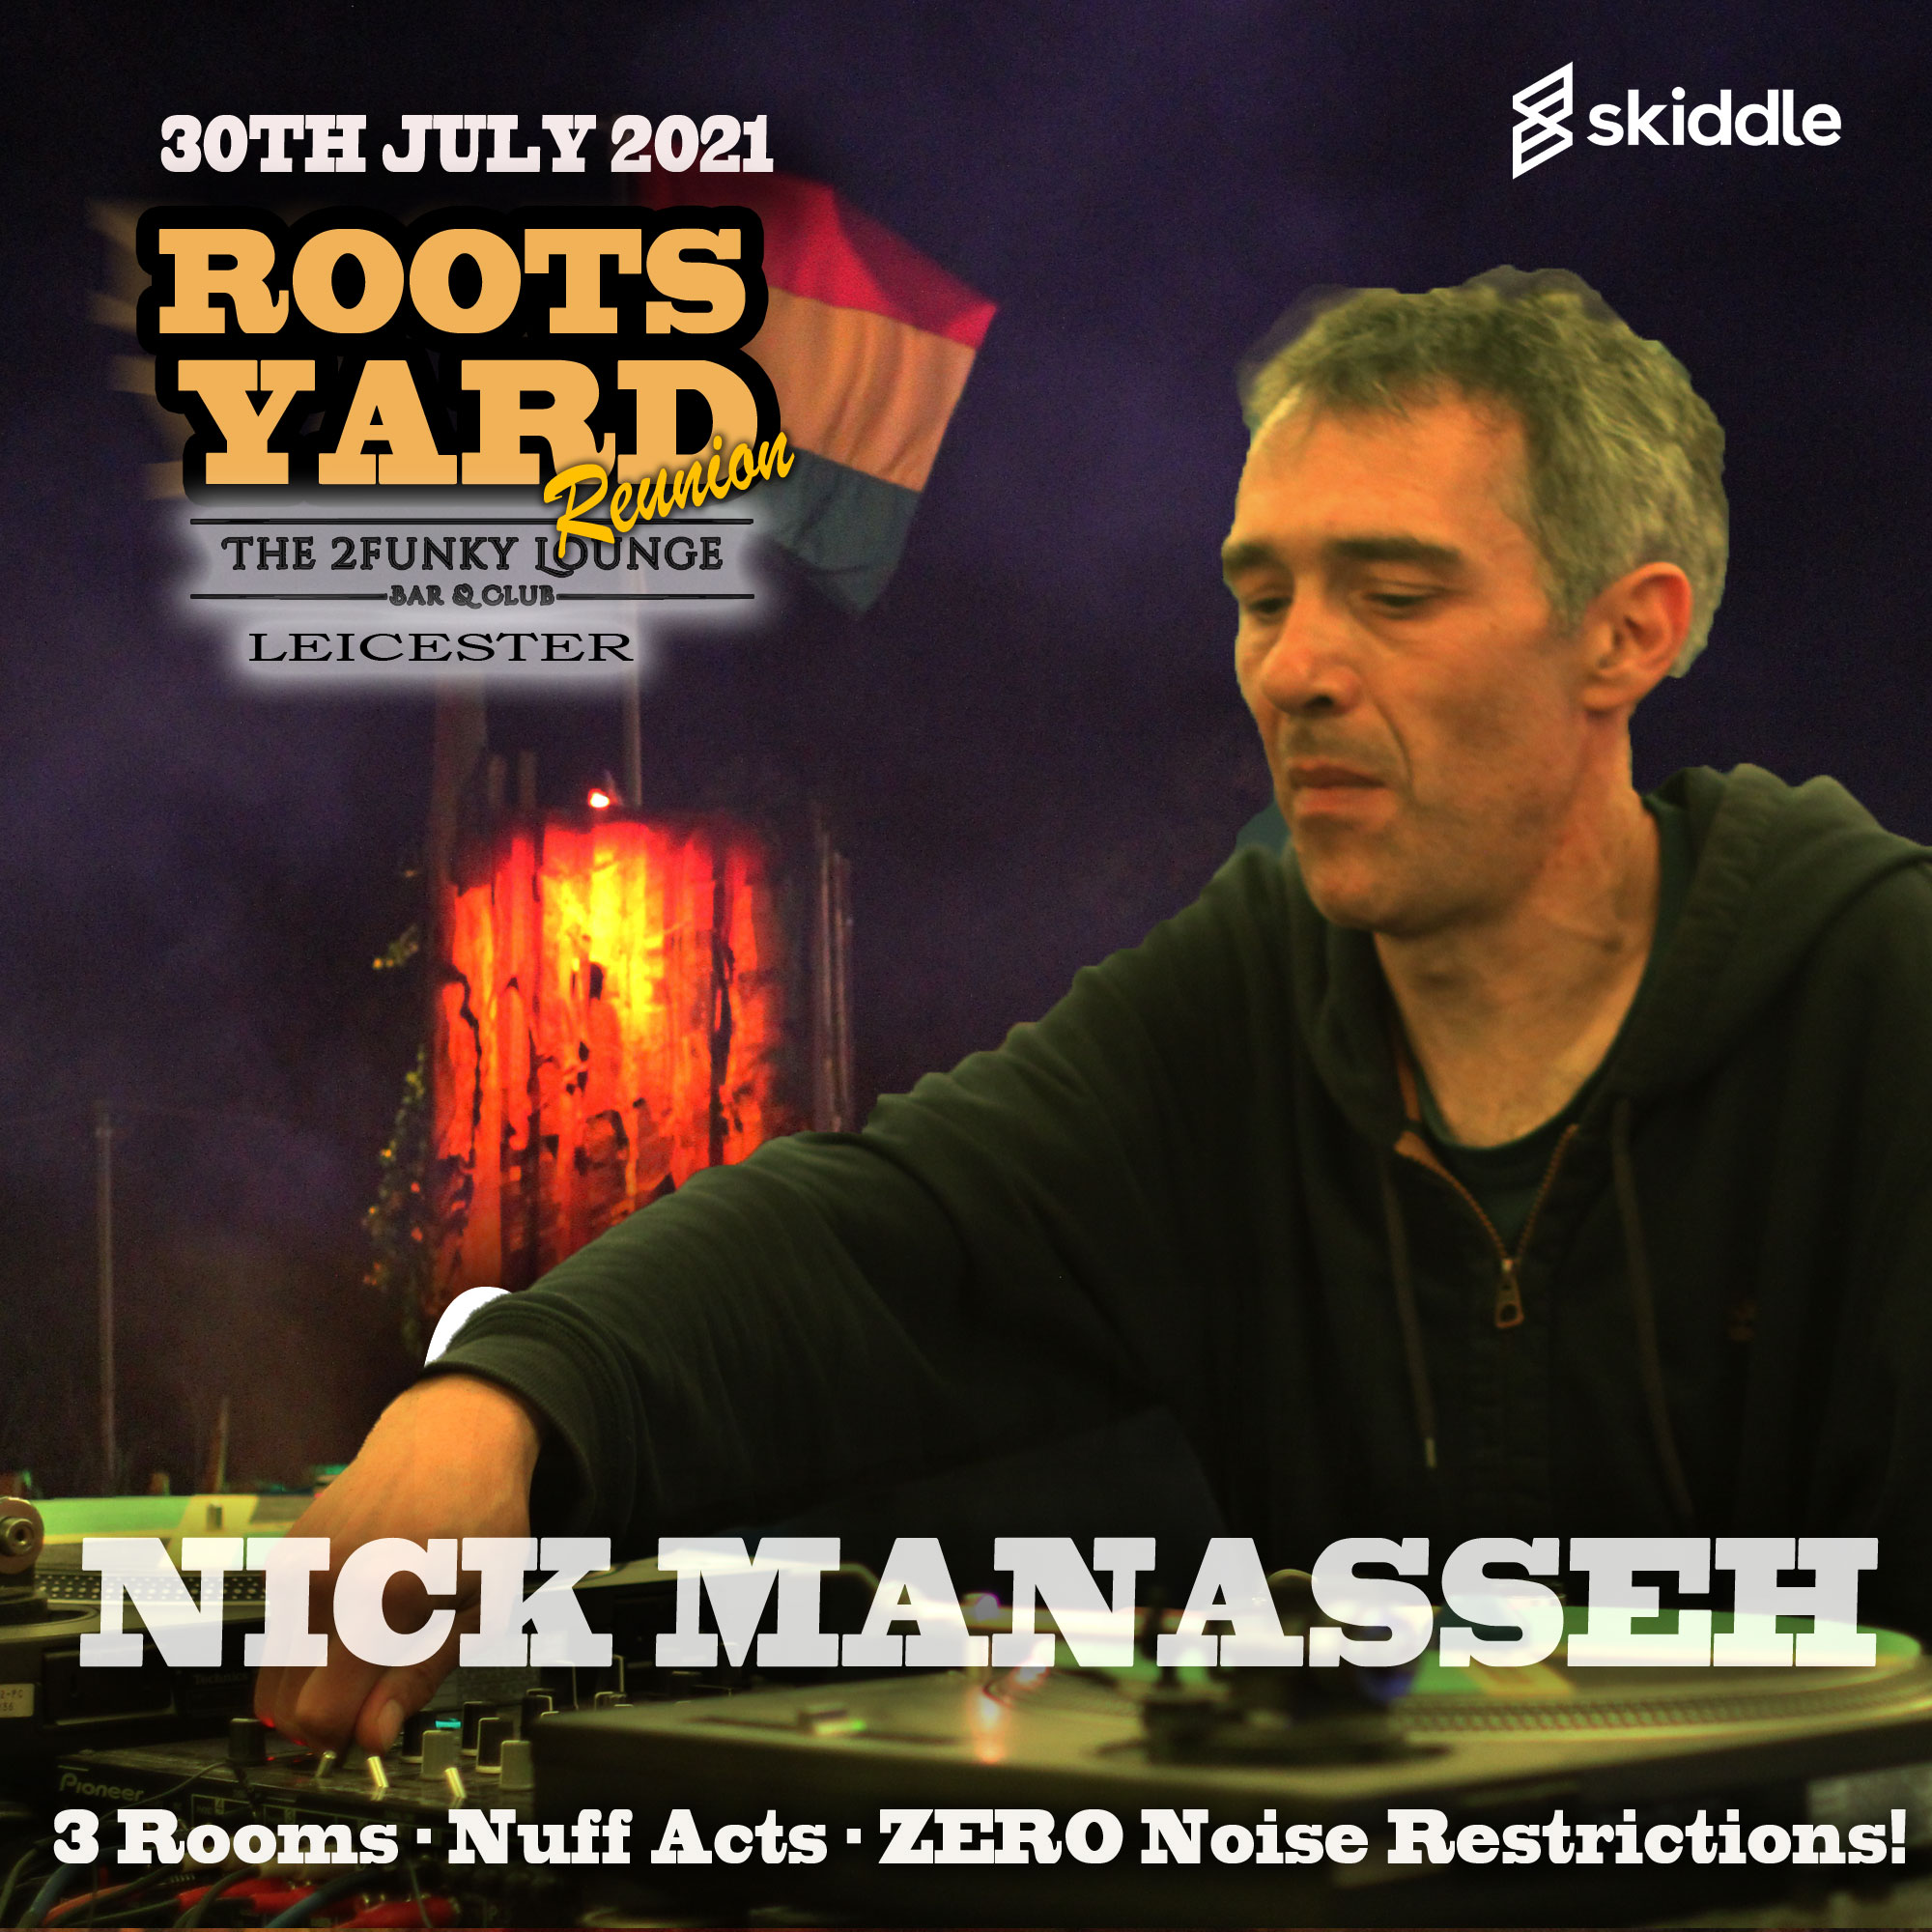 MANASSEH---roots-yard-reunion-insta-post